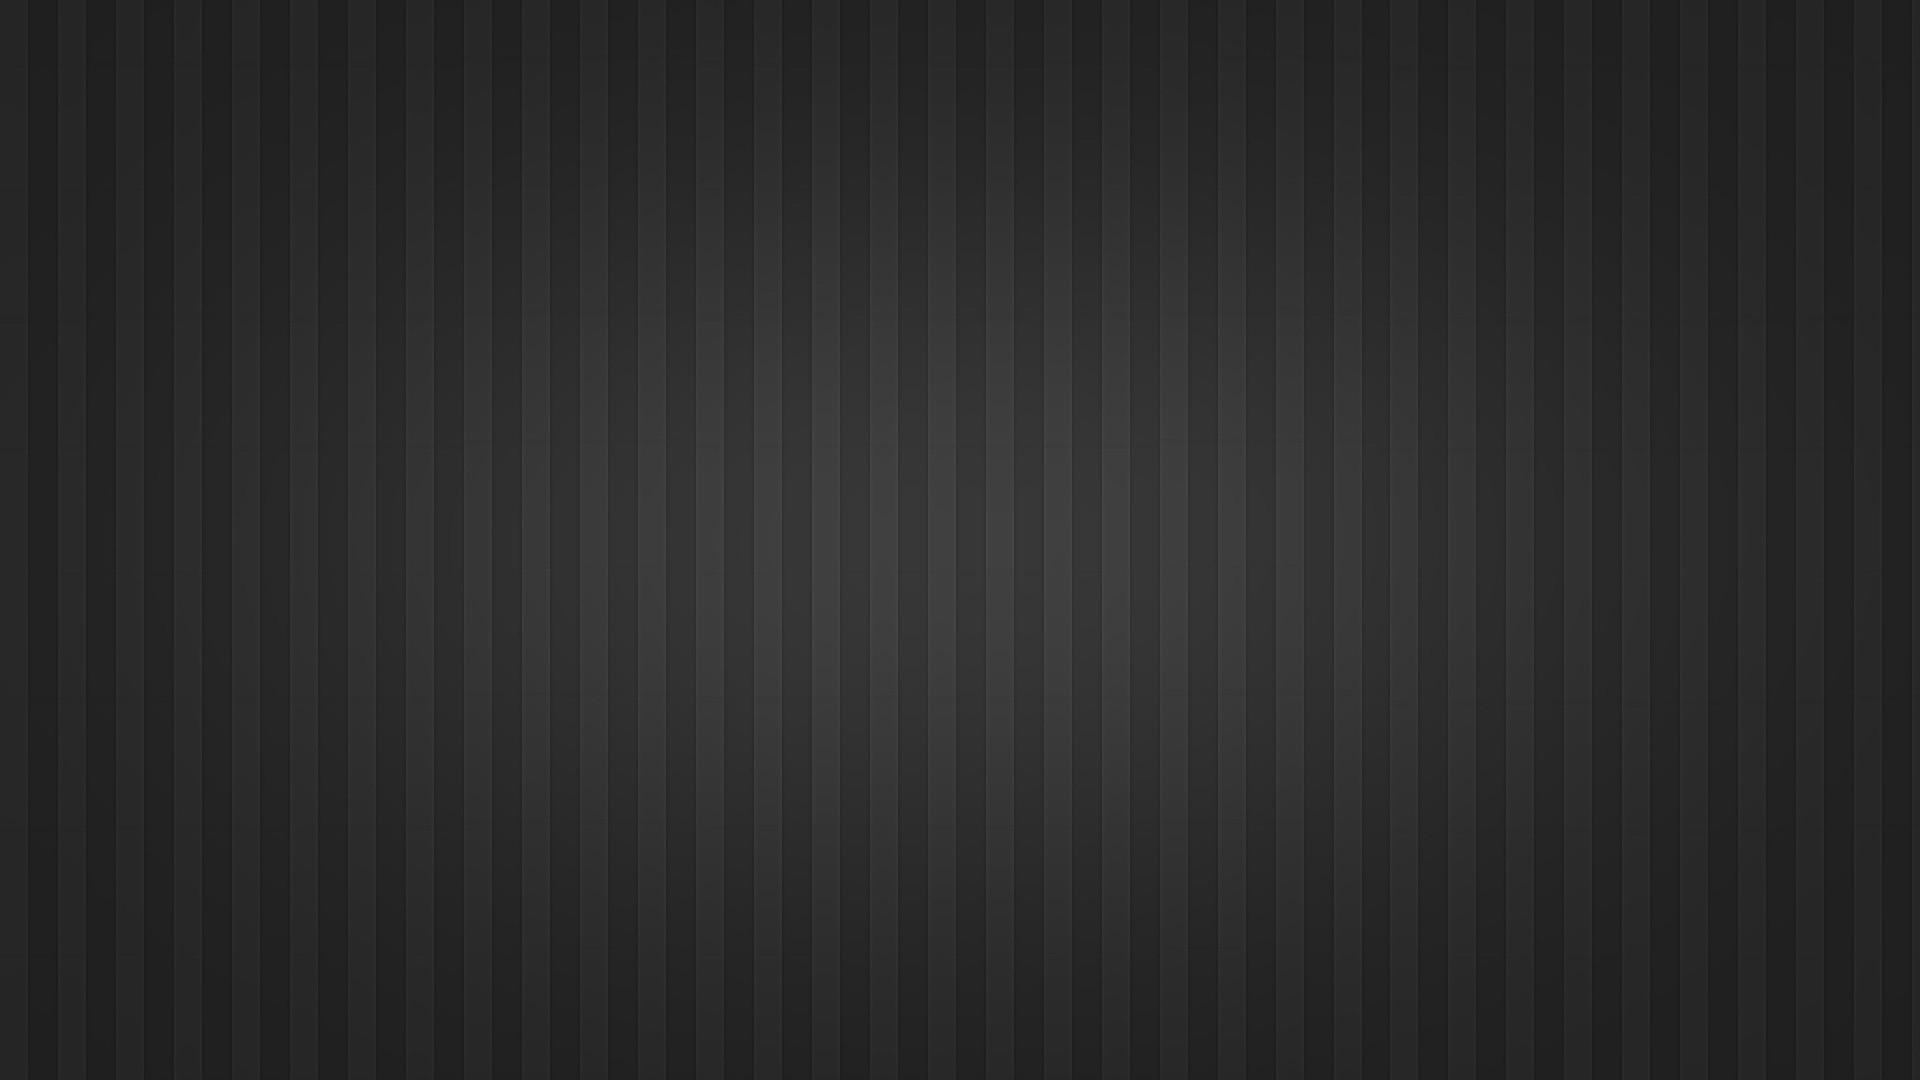 Dark Stripes Wallpaper 8811